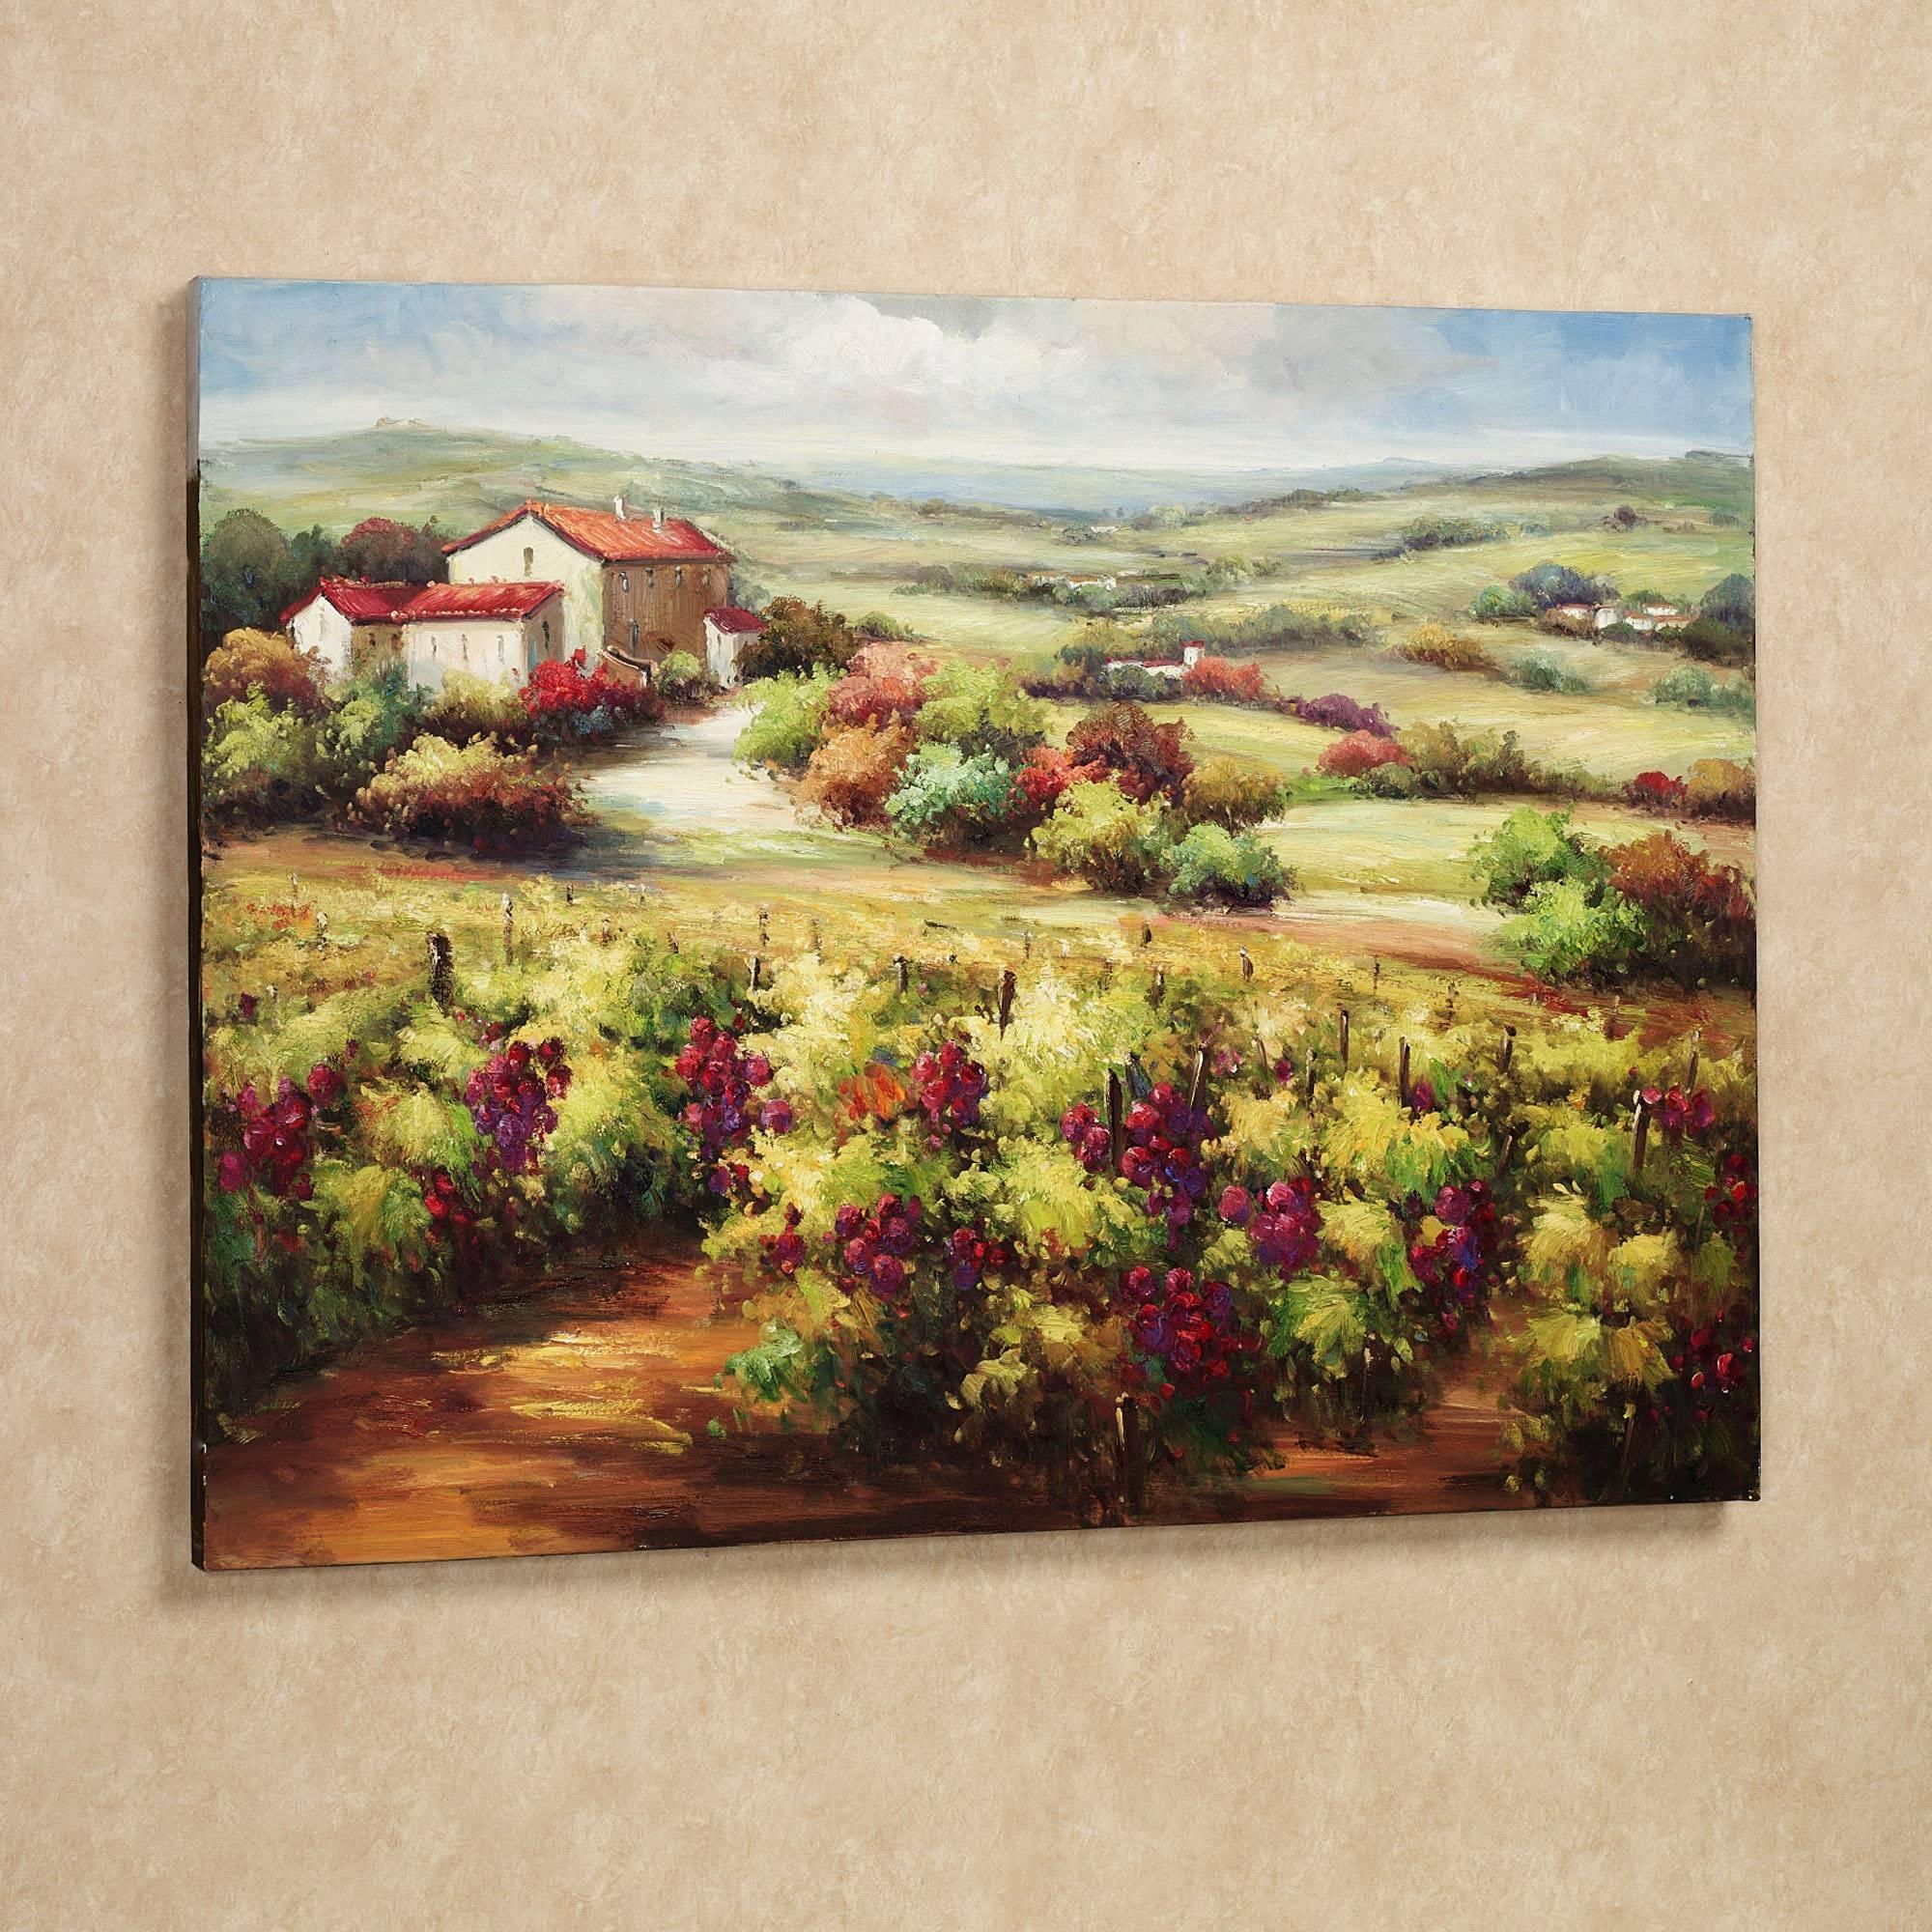 Wall Art Designs: Terrific Vineyard Wall Art Wine Decor Kitchen Inside Current Vineyard Wall Art (View 3 of 20)